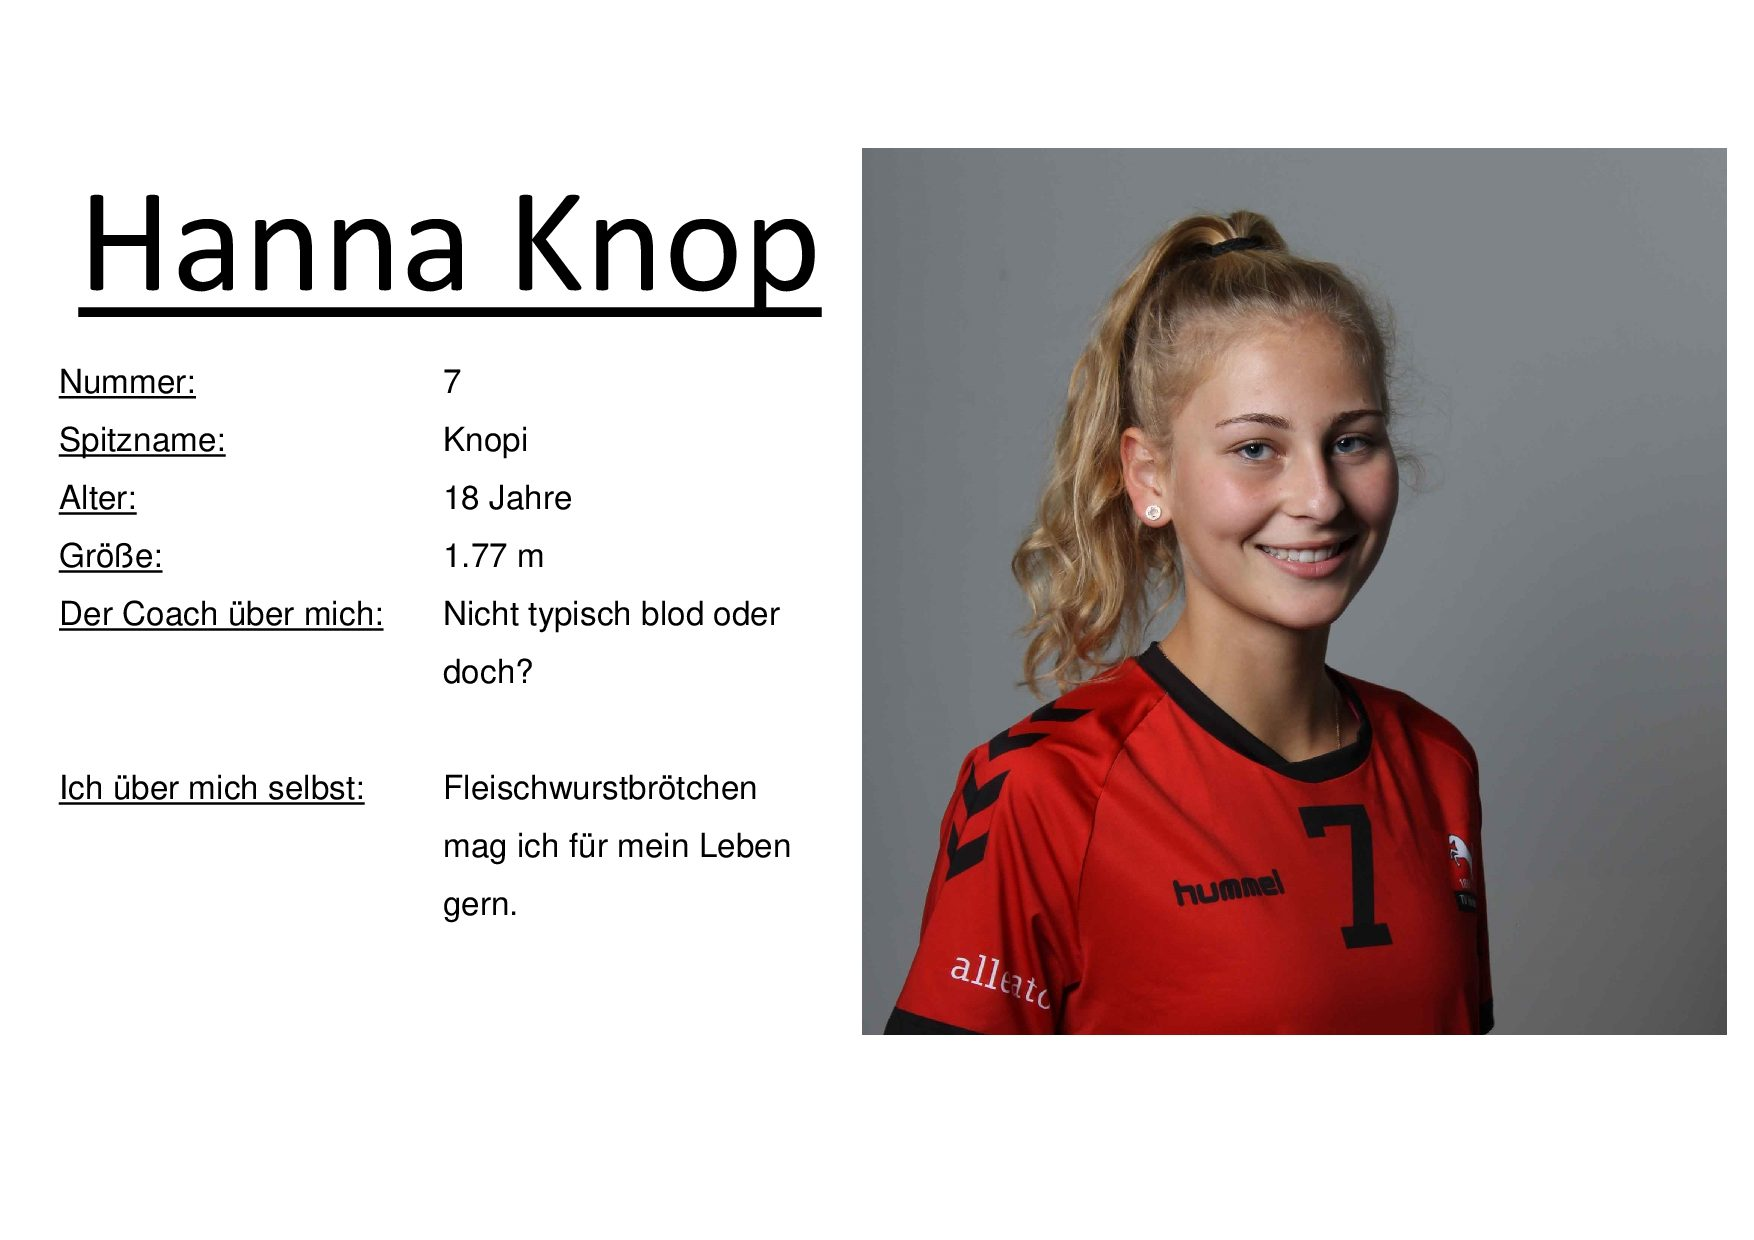 Hanna Knop